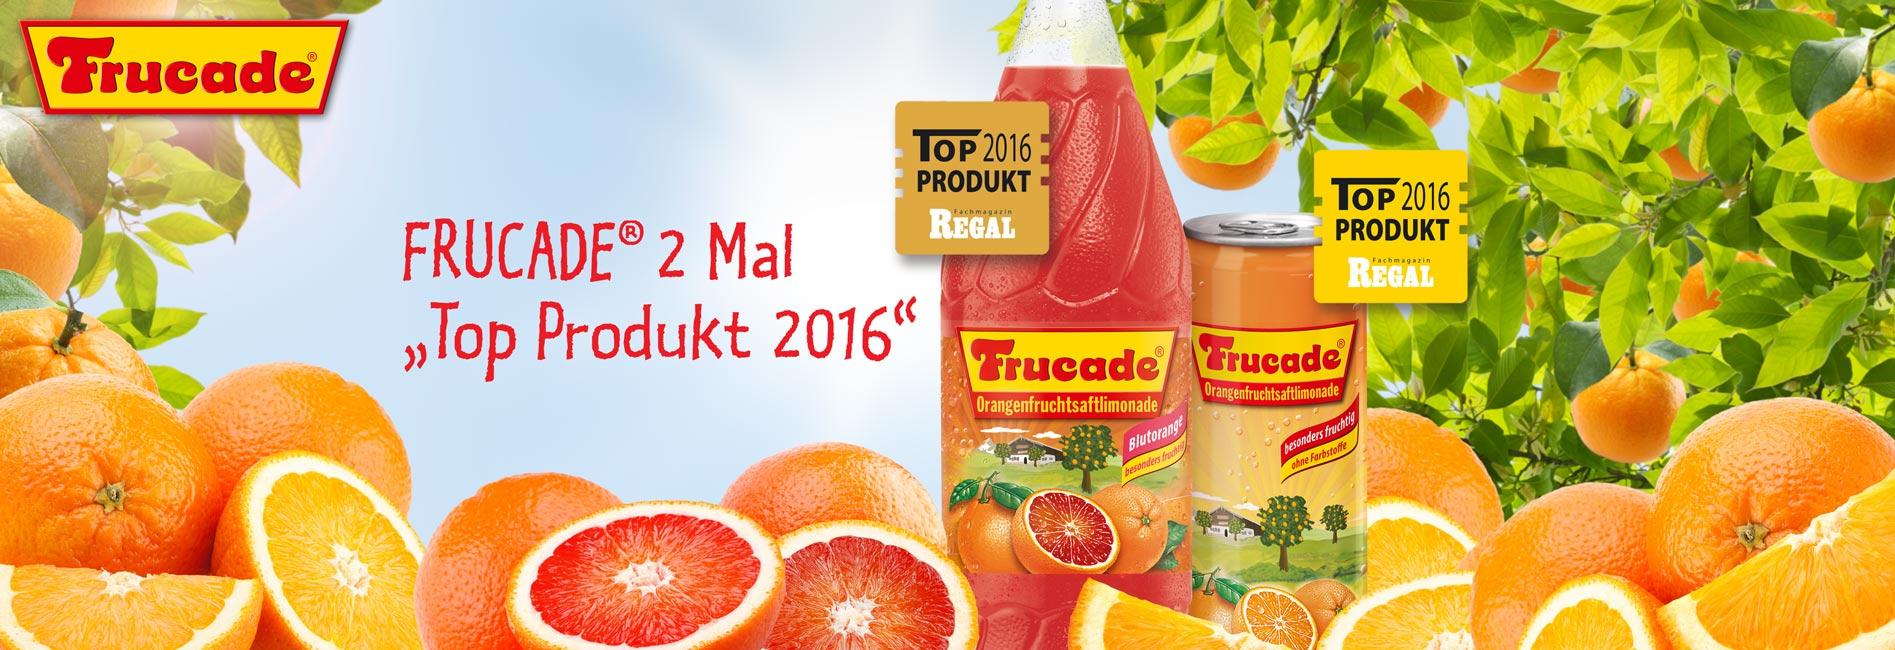 "FRUCADE®  mit Doppelerfolg bei Innovationswettbewerb ""Top Produkt 2016"""